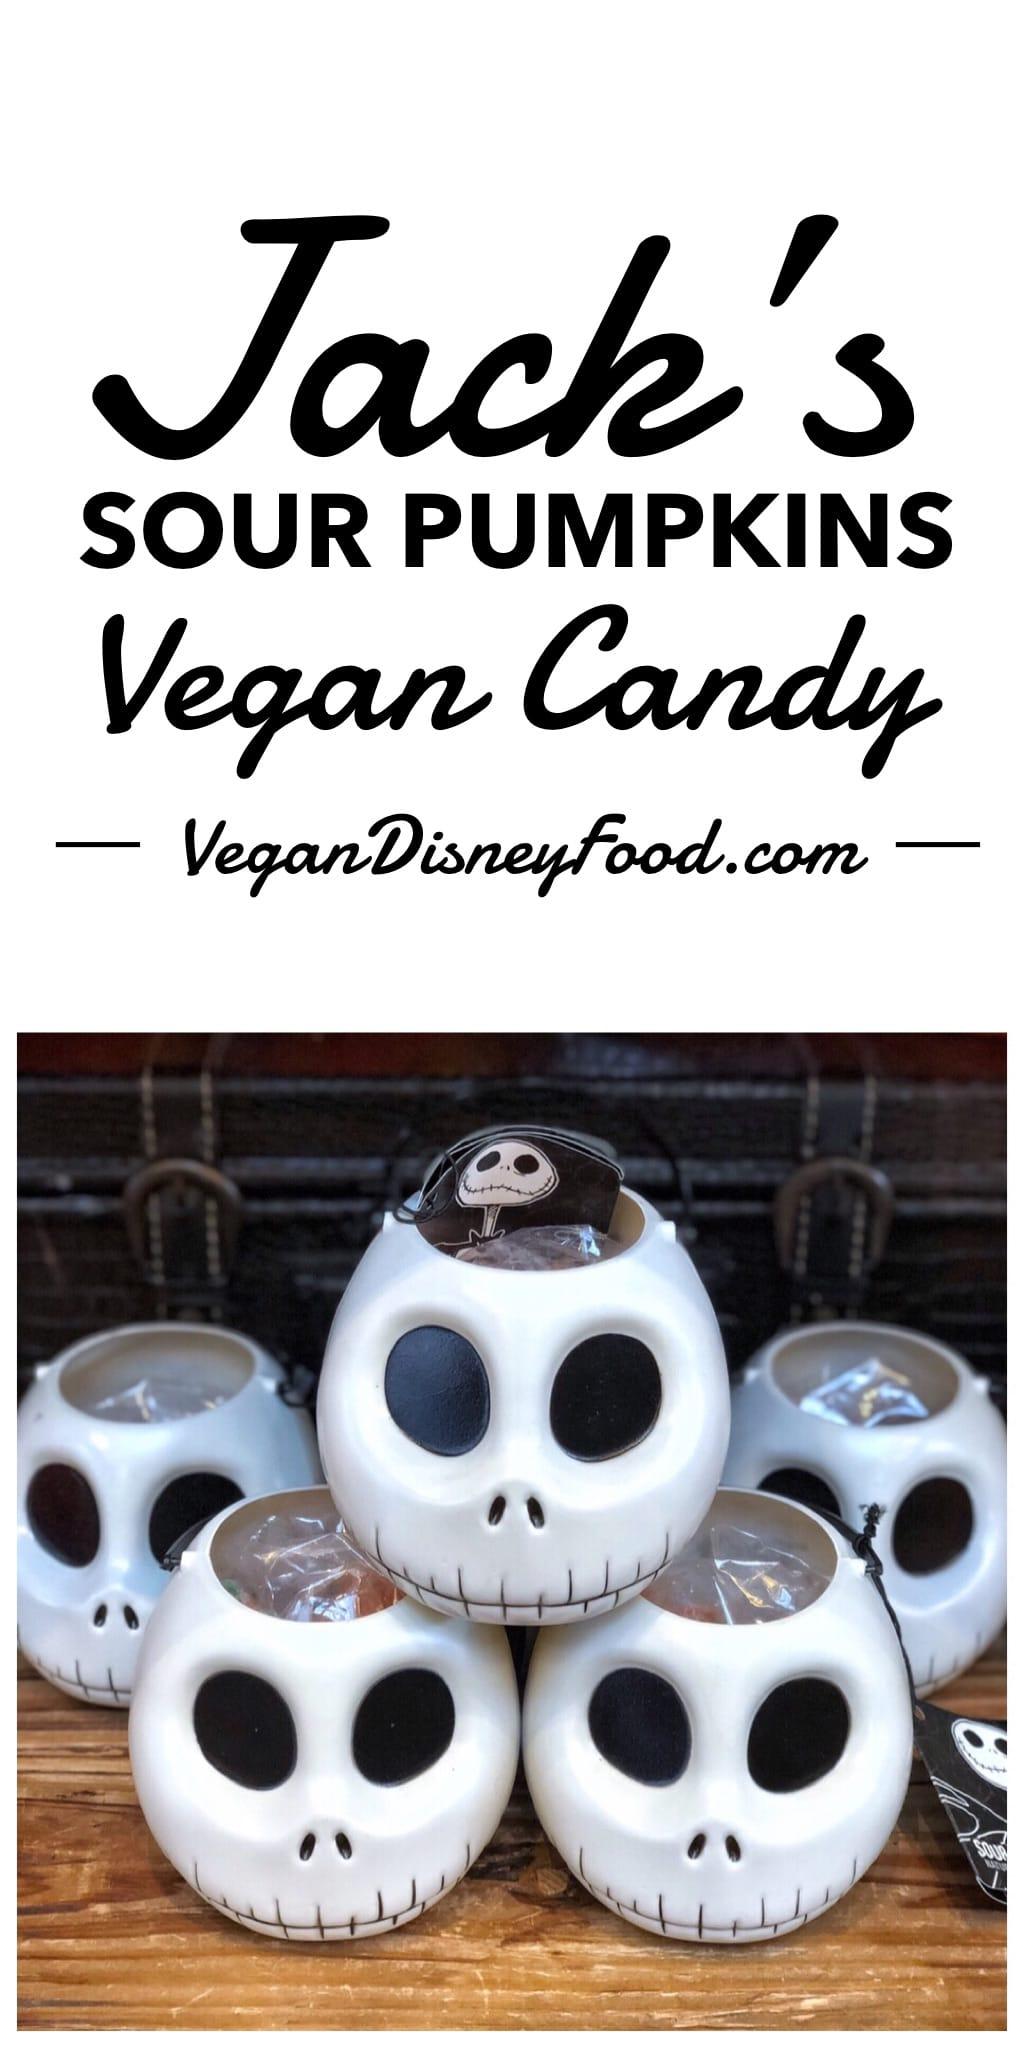 Jack's Sour Pumpkin Vegan Gummies Halloween Candy at Walt Disney World